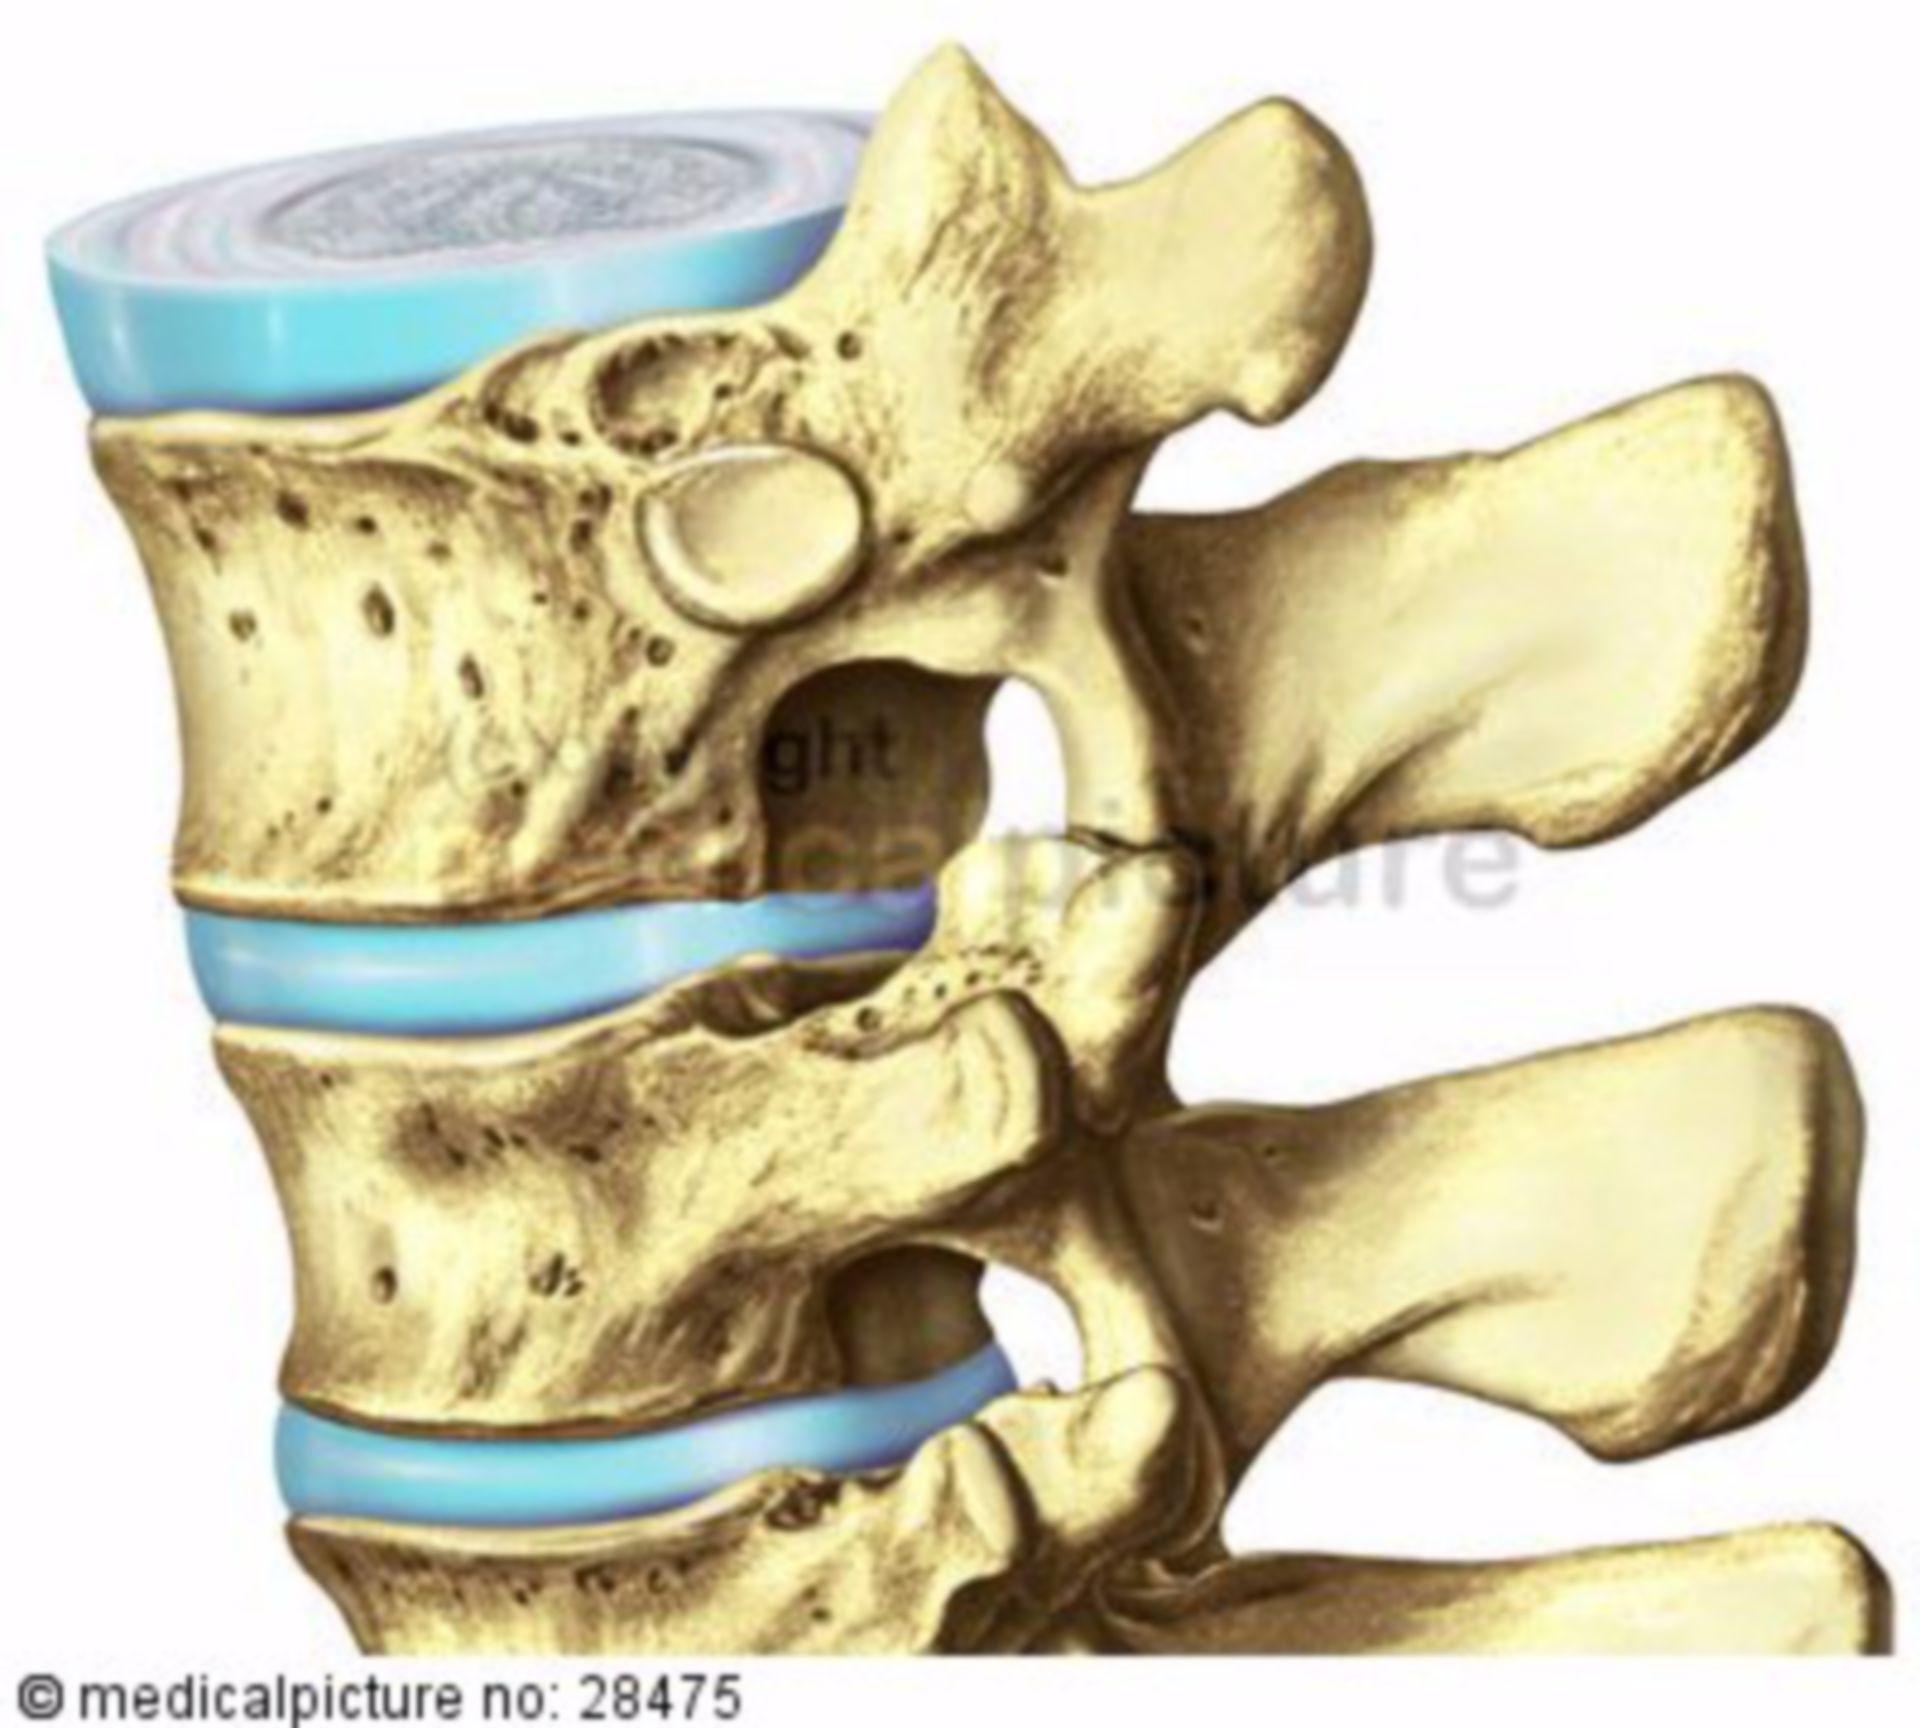 Spinal column and intervertebral disc